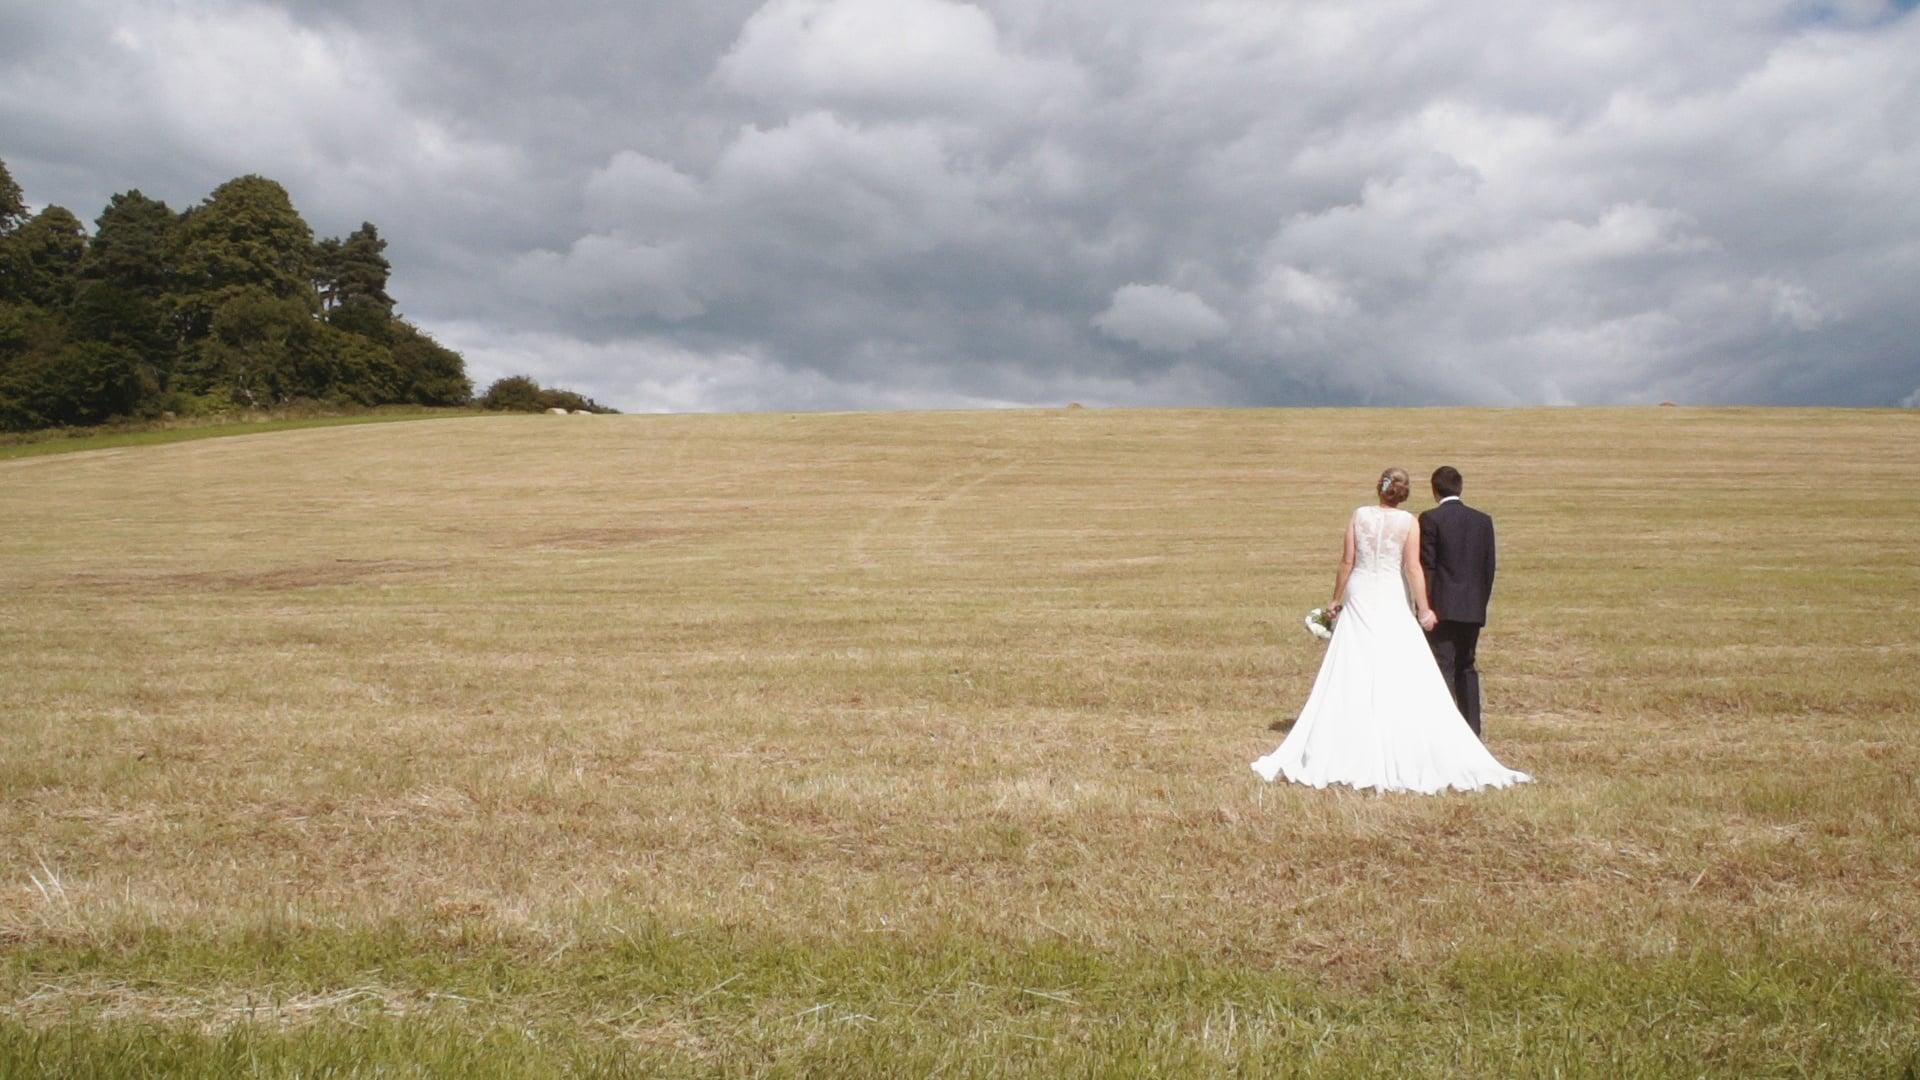 Annette & Niall - Wedding at Farnham Estate, Cavan